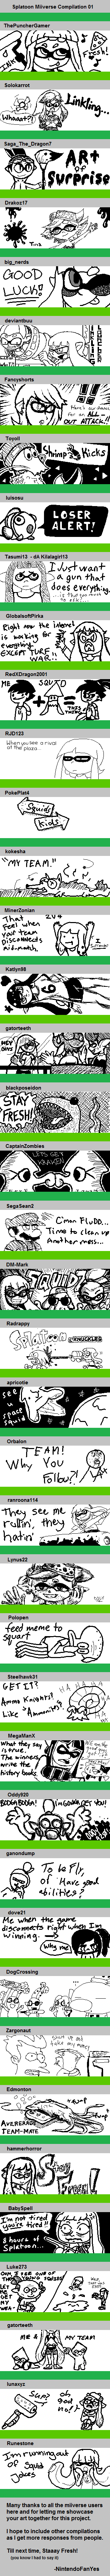 Splatoon Miiverse Compilation 01 by NintendoFanYes